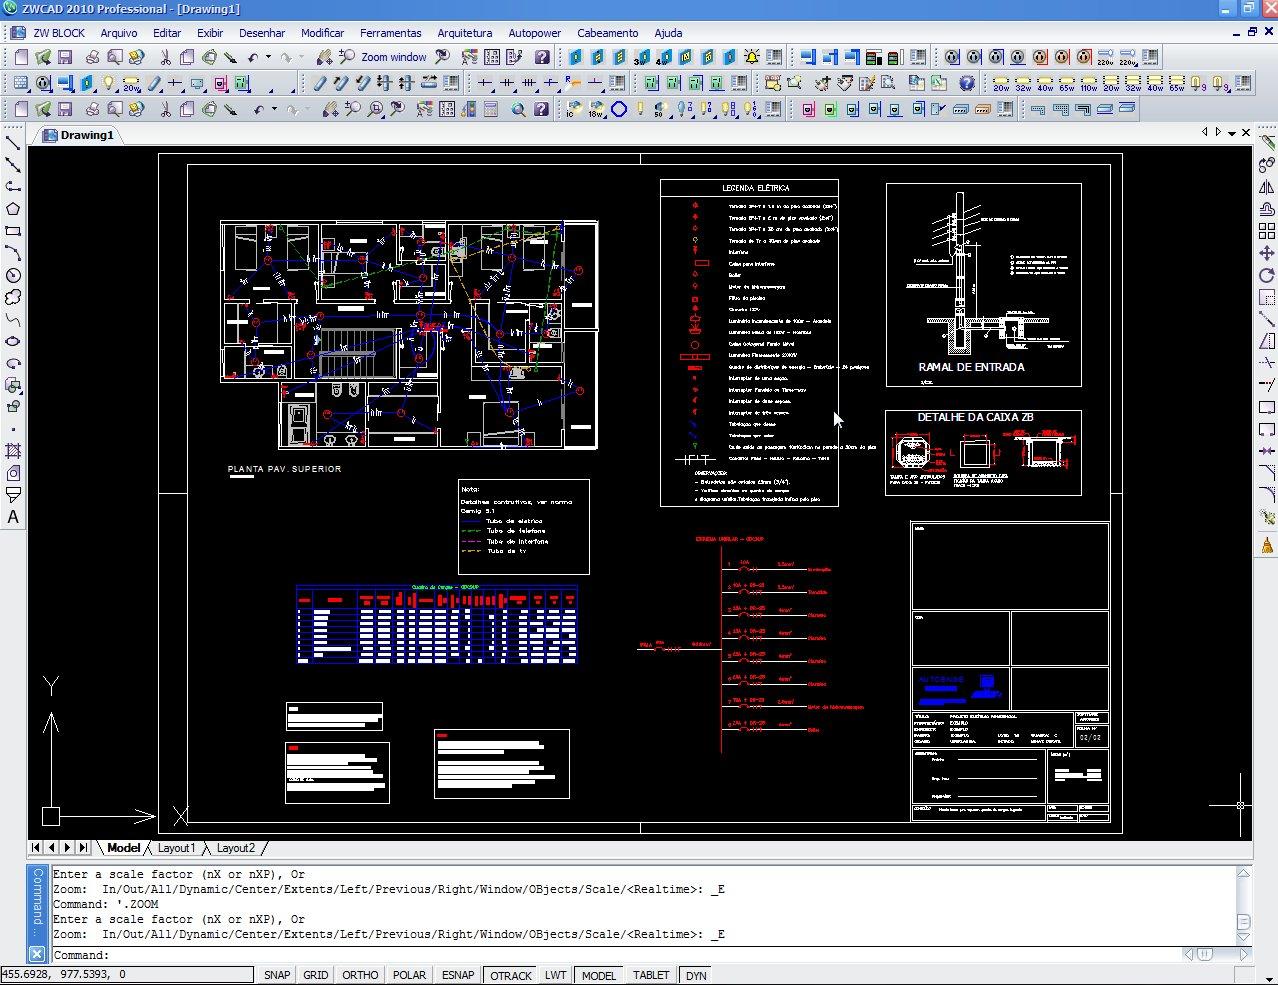 Projeto elétrico realizado no AutoPower